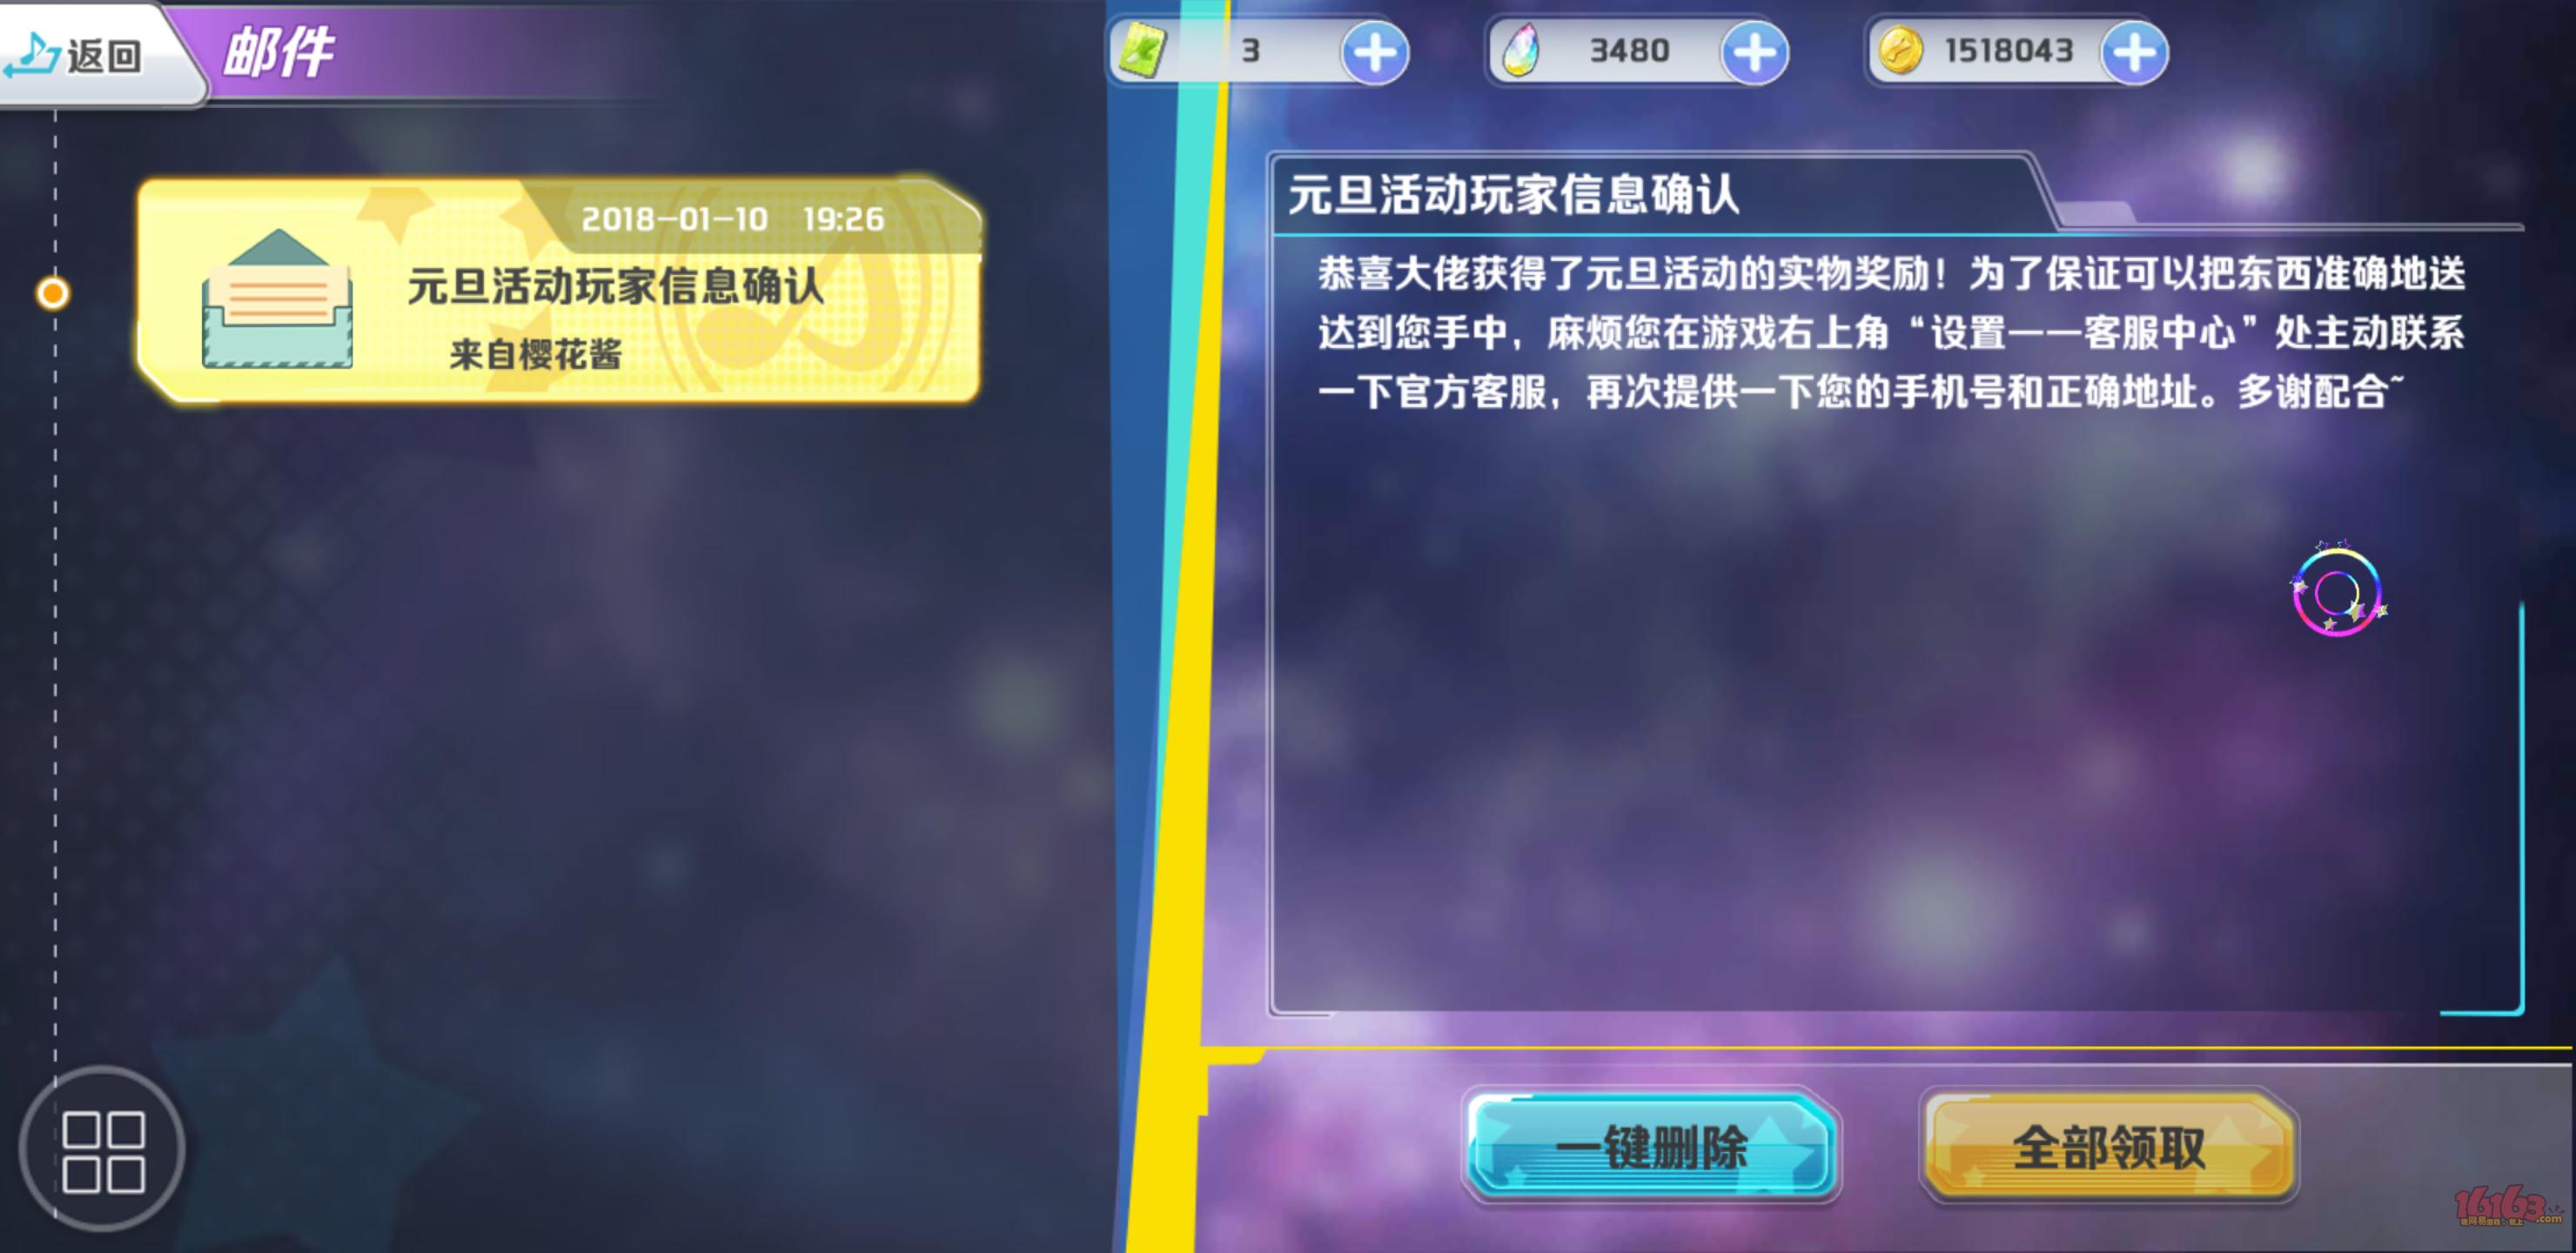 Screenshot_20180112-012926.png